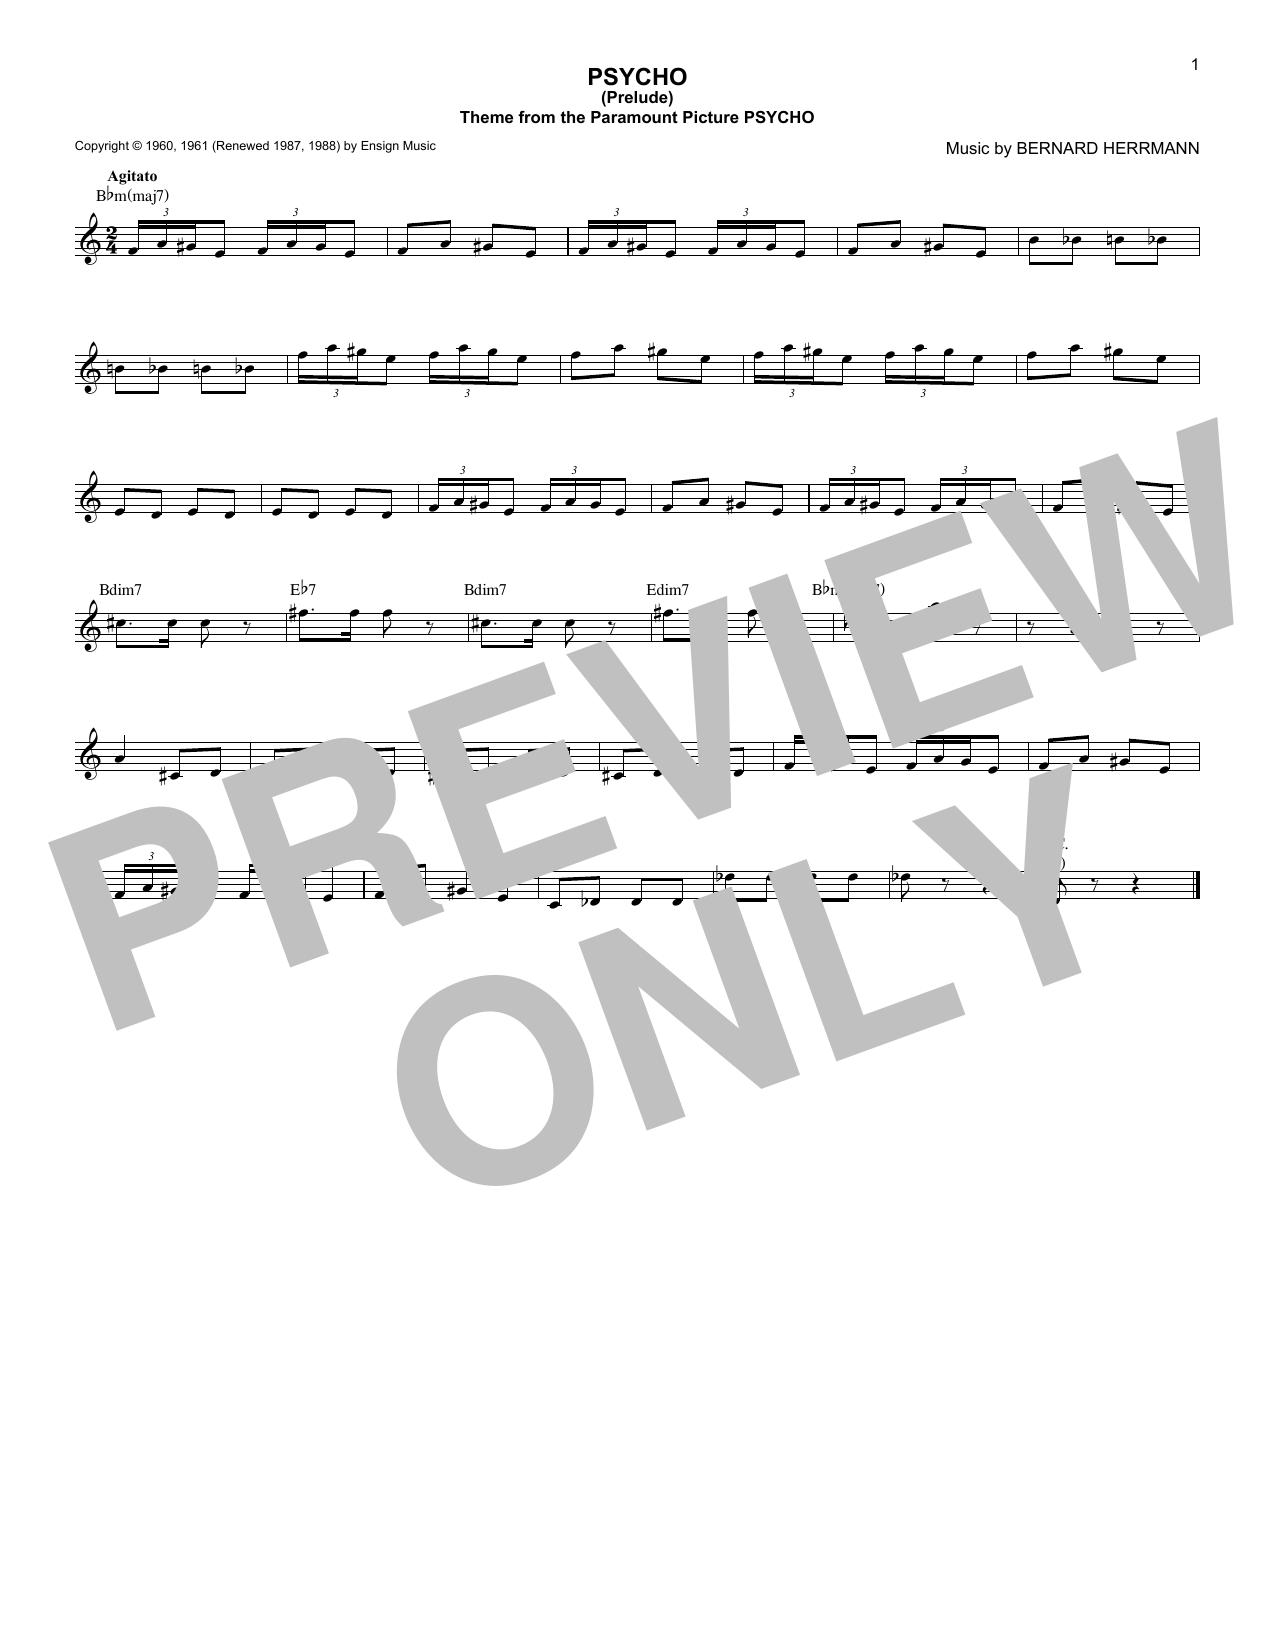 Bernard Herrmann - Psycho (Prelude)